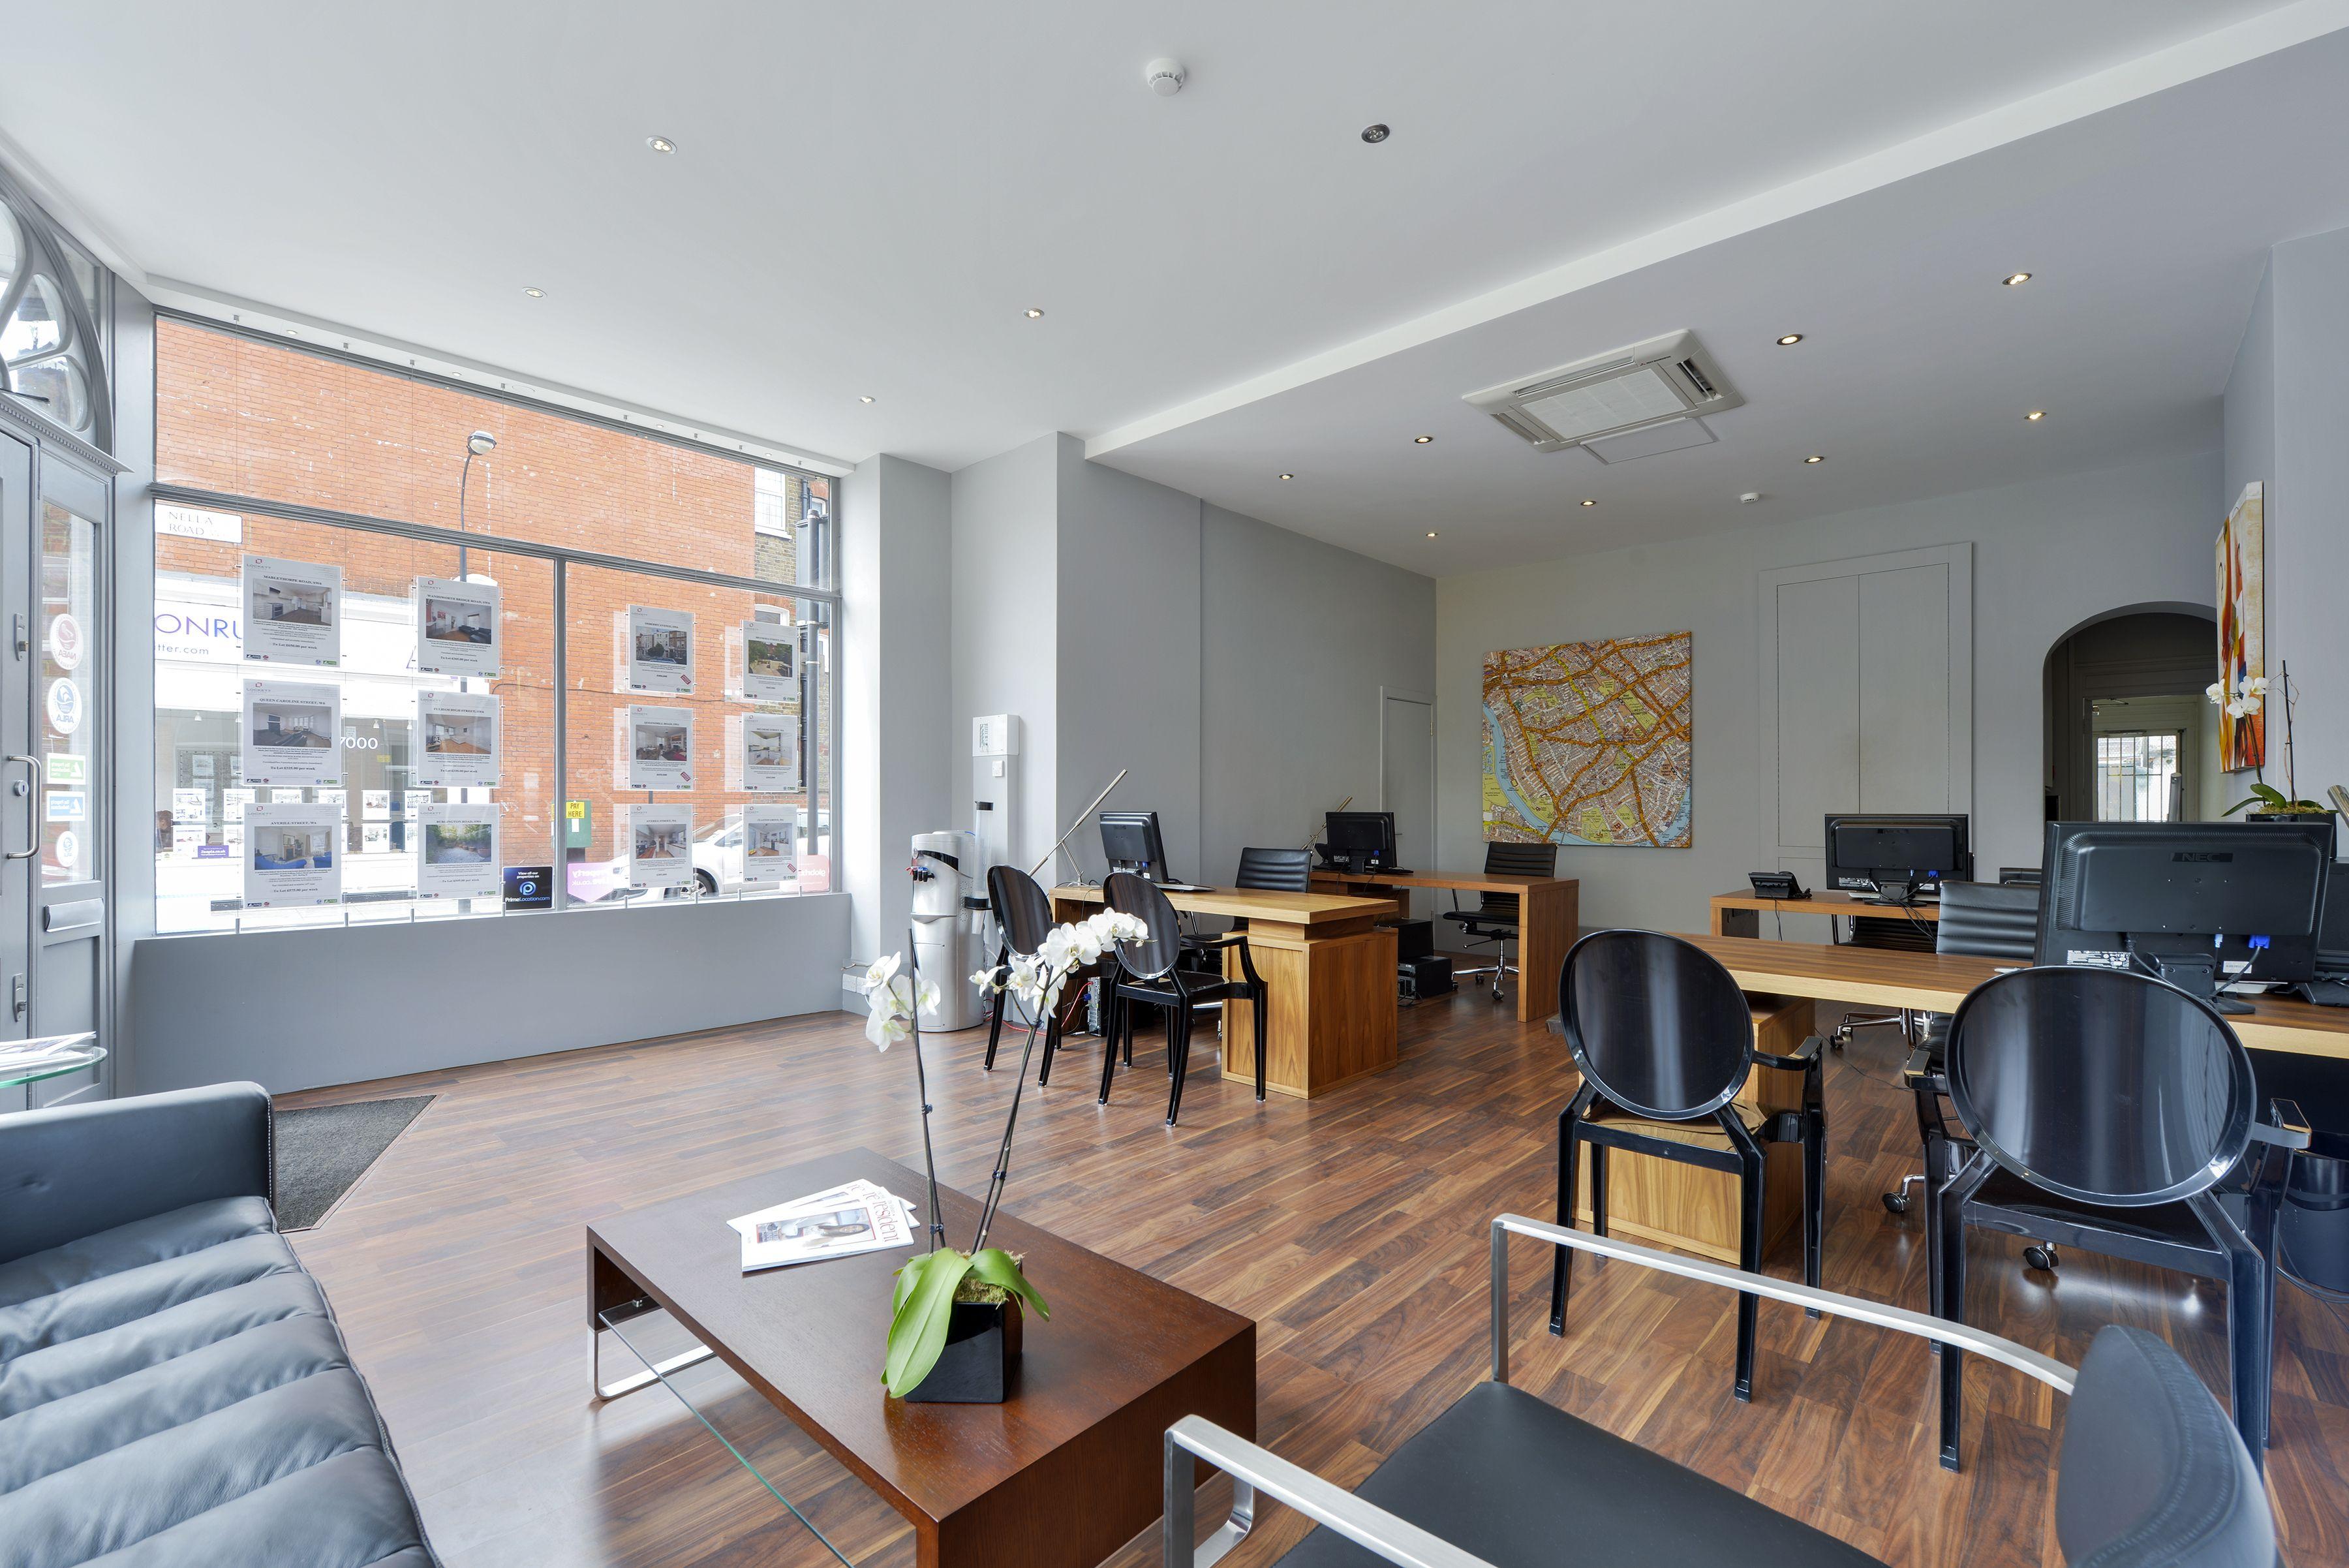 Estate Agent, office Office space Pinterest Estate